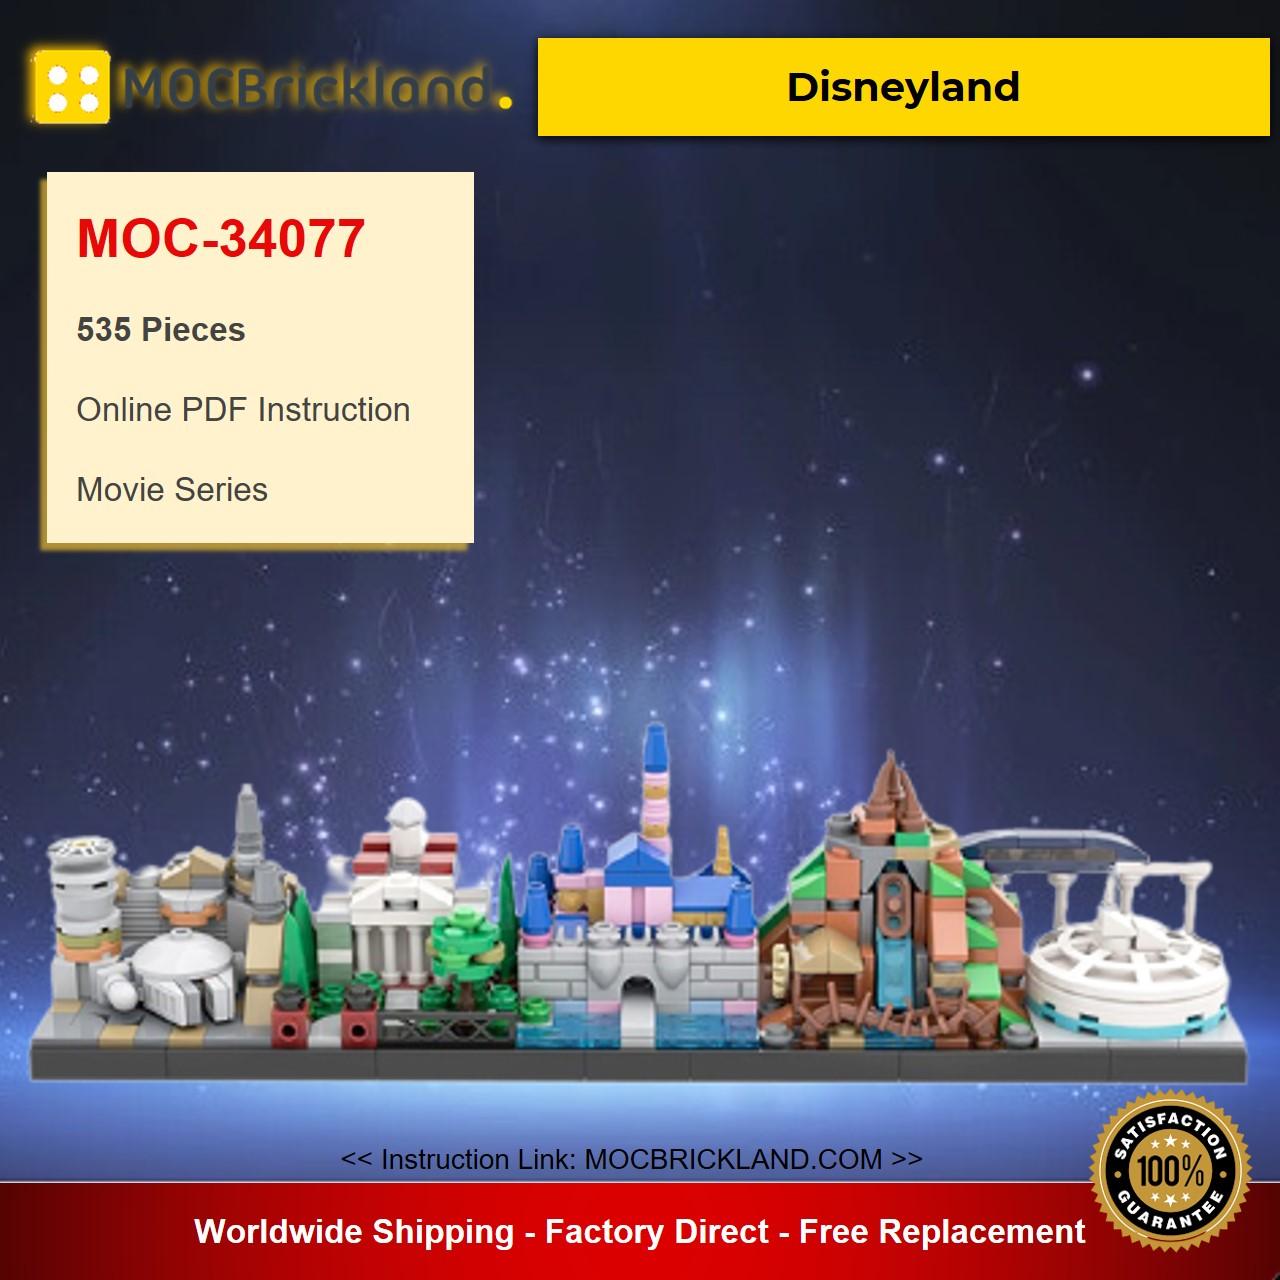 Disneyland MOC-34077 Movie Designed By benbuildslego With 535 Pieces